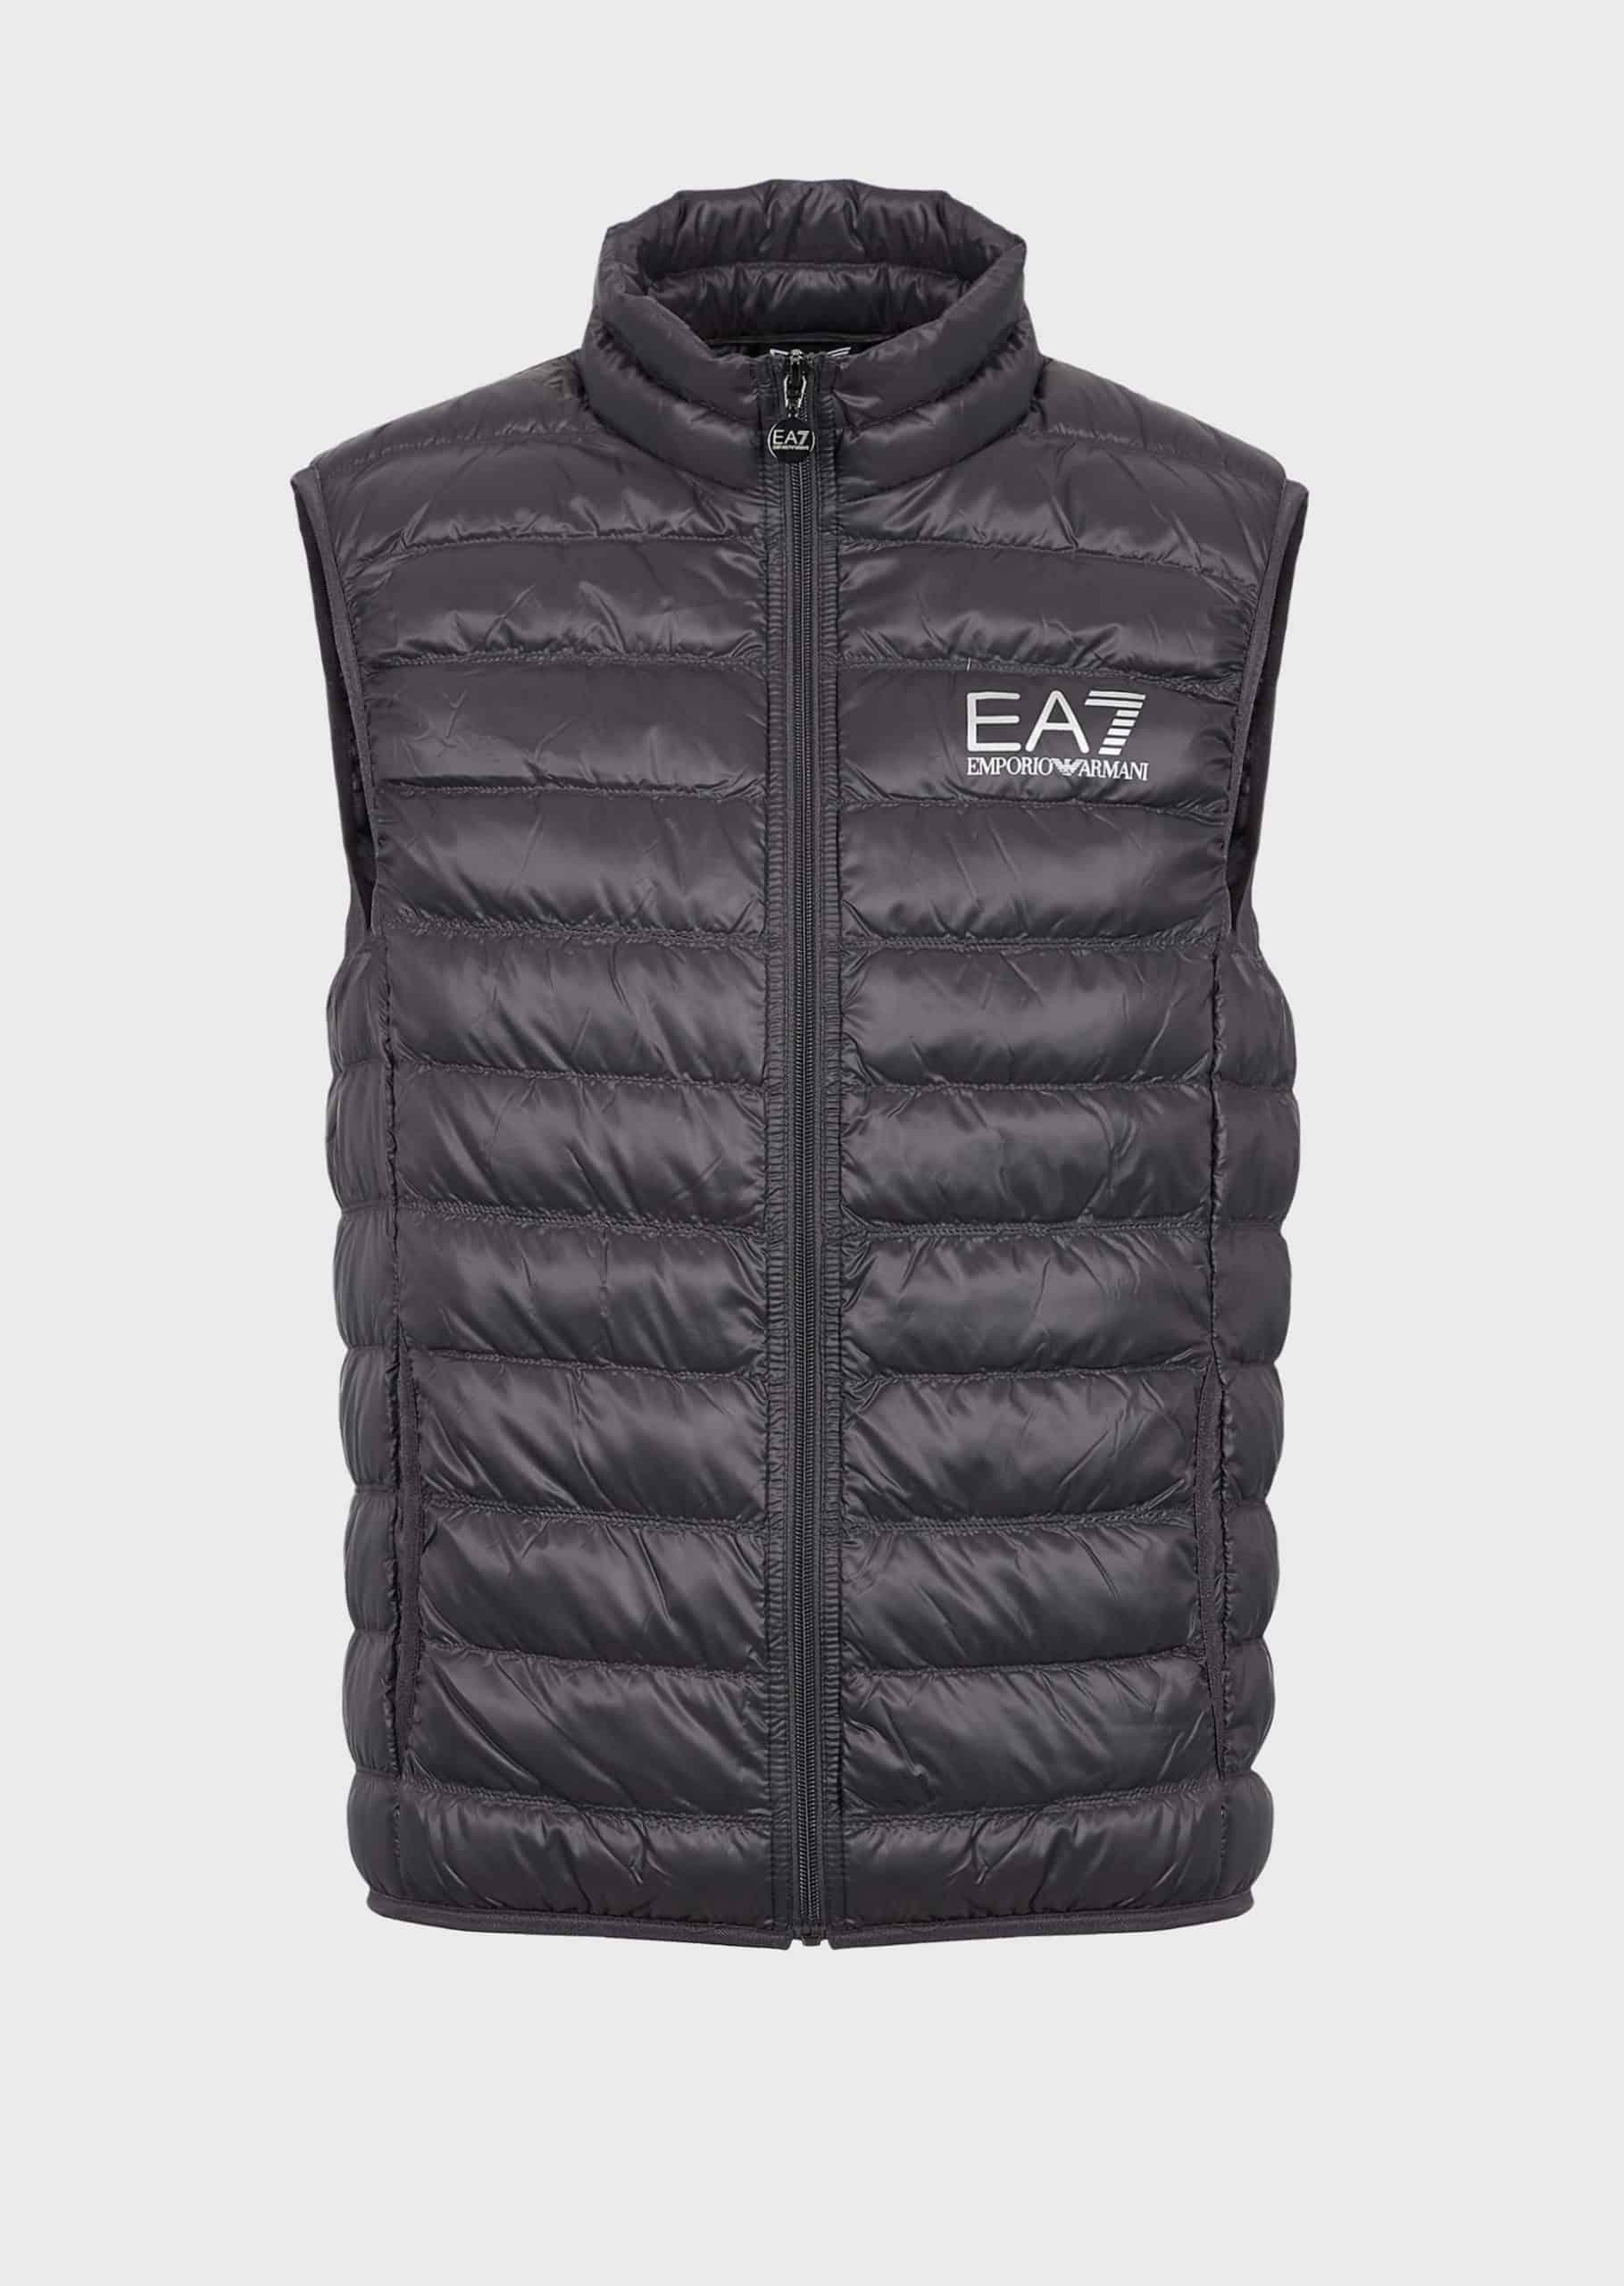 Armani EA7 Sleeveless Puffer Jacket